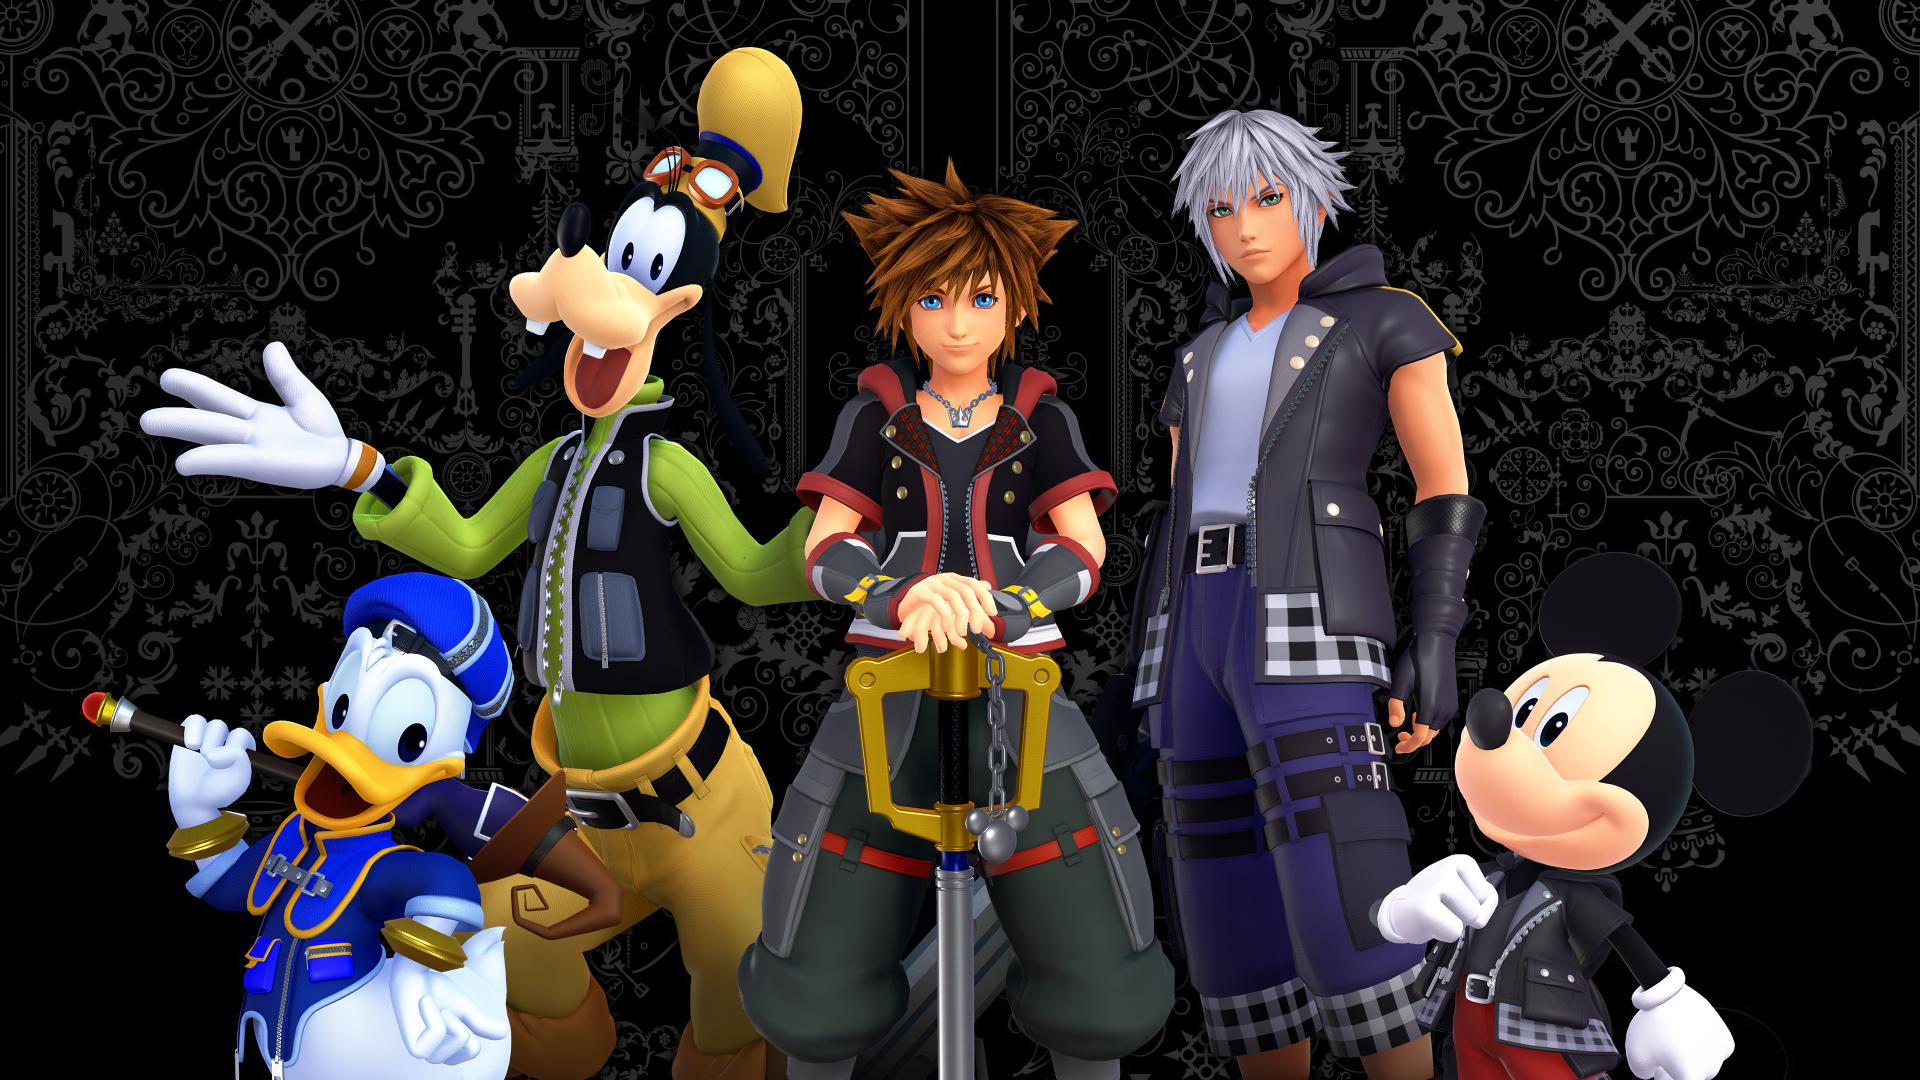 Video Game Kingdom Hearts Iii Kingdom Hearts Sora Kingdom Hearts Donald Duck Goofy Riku Kingdom Kingdom Hearts Sora Kingdom Hearts Kingdom Hearts Wallpaper